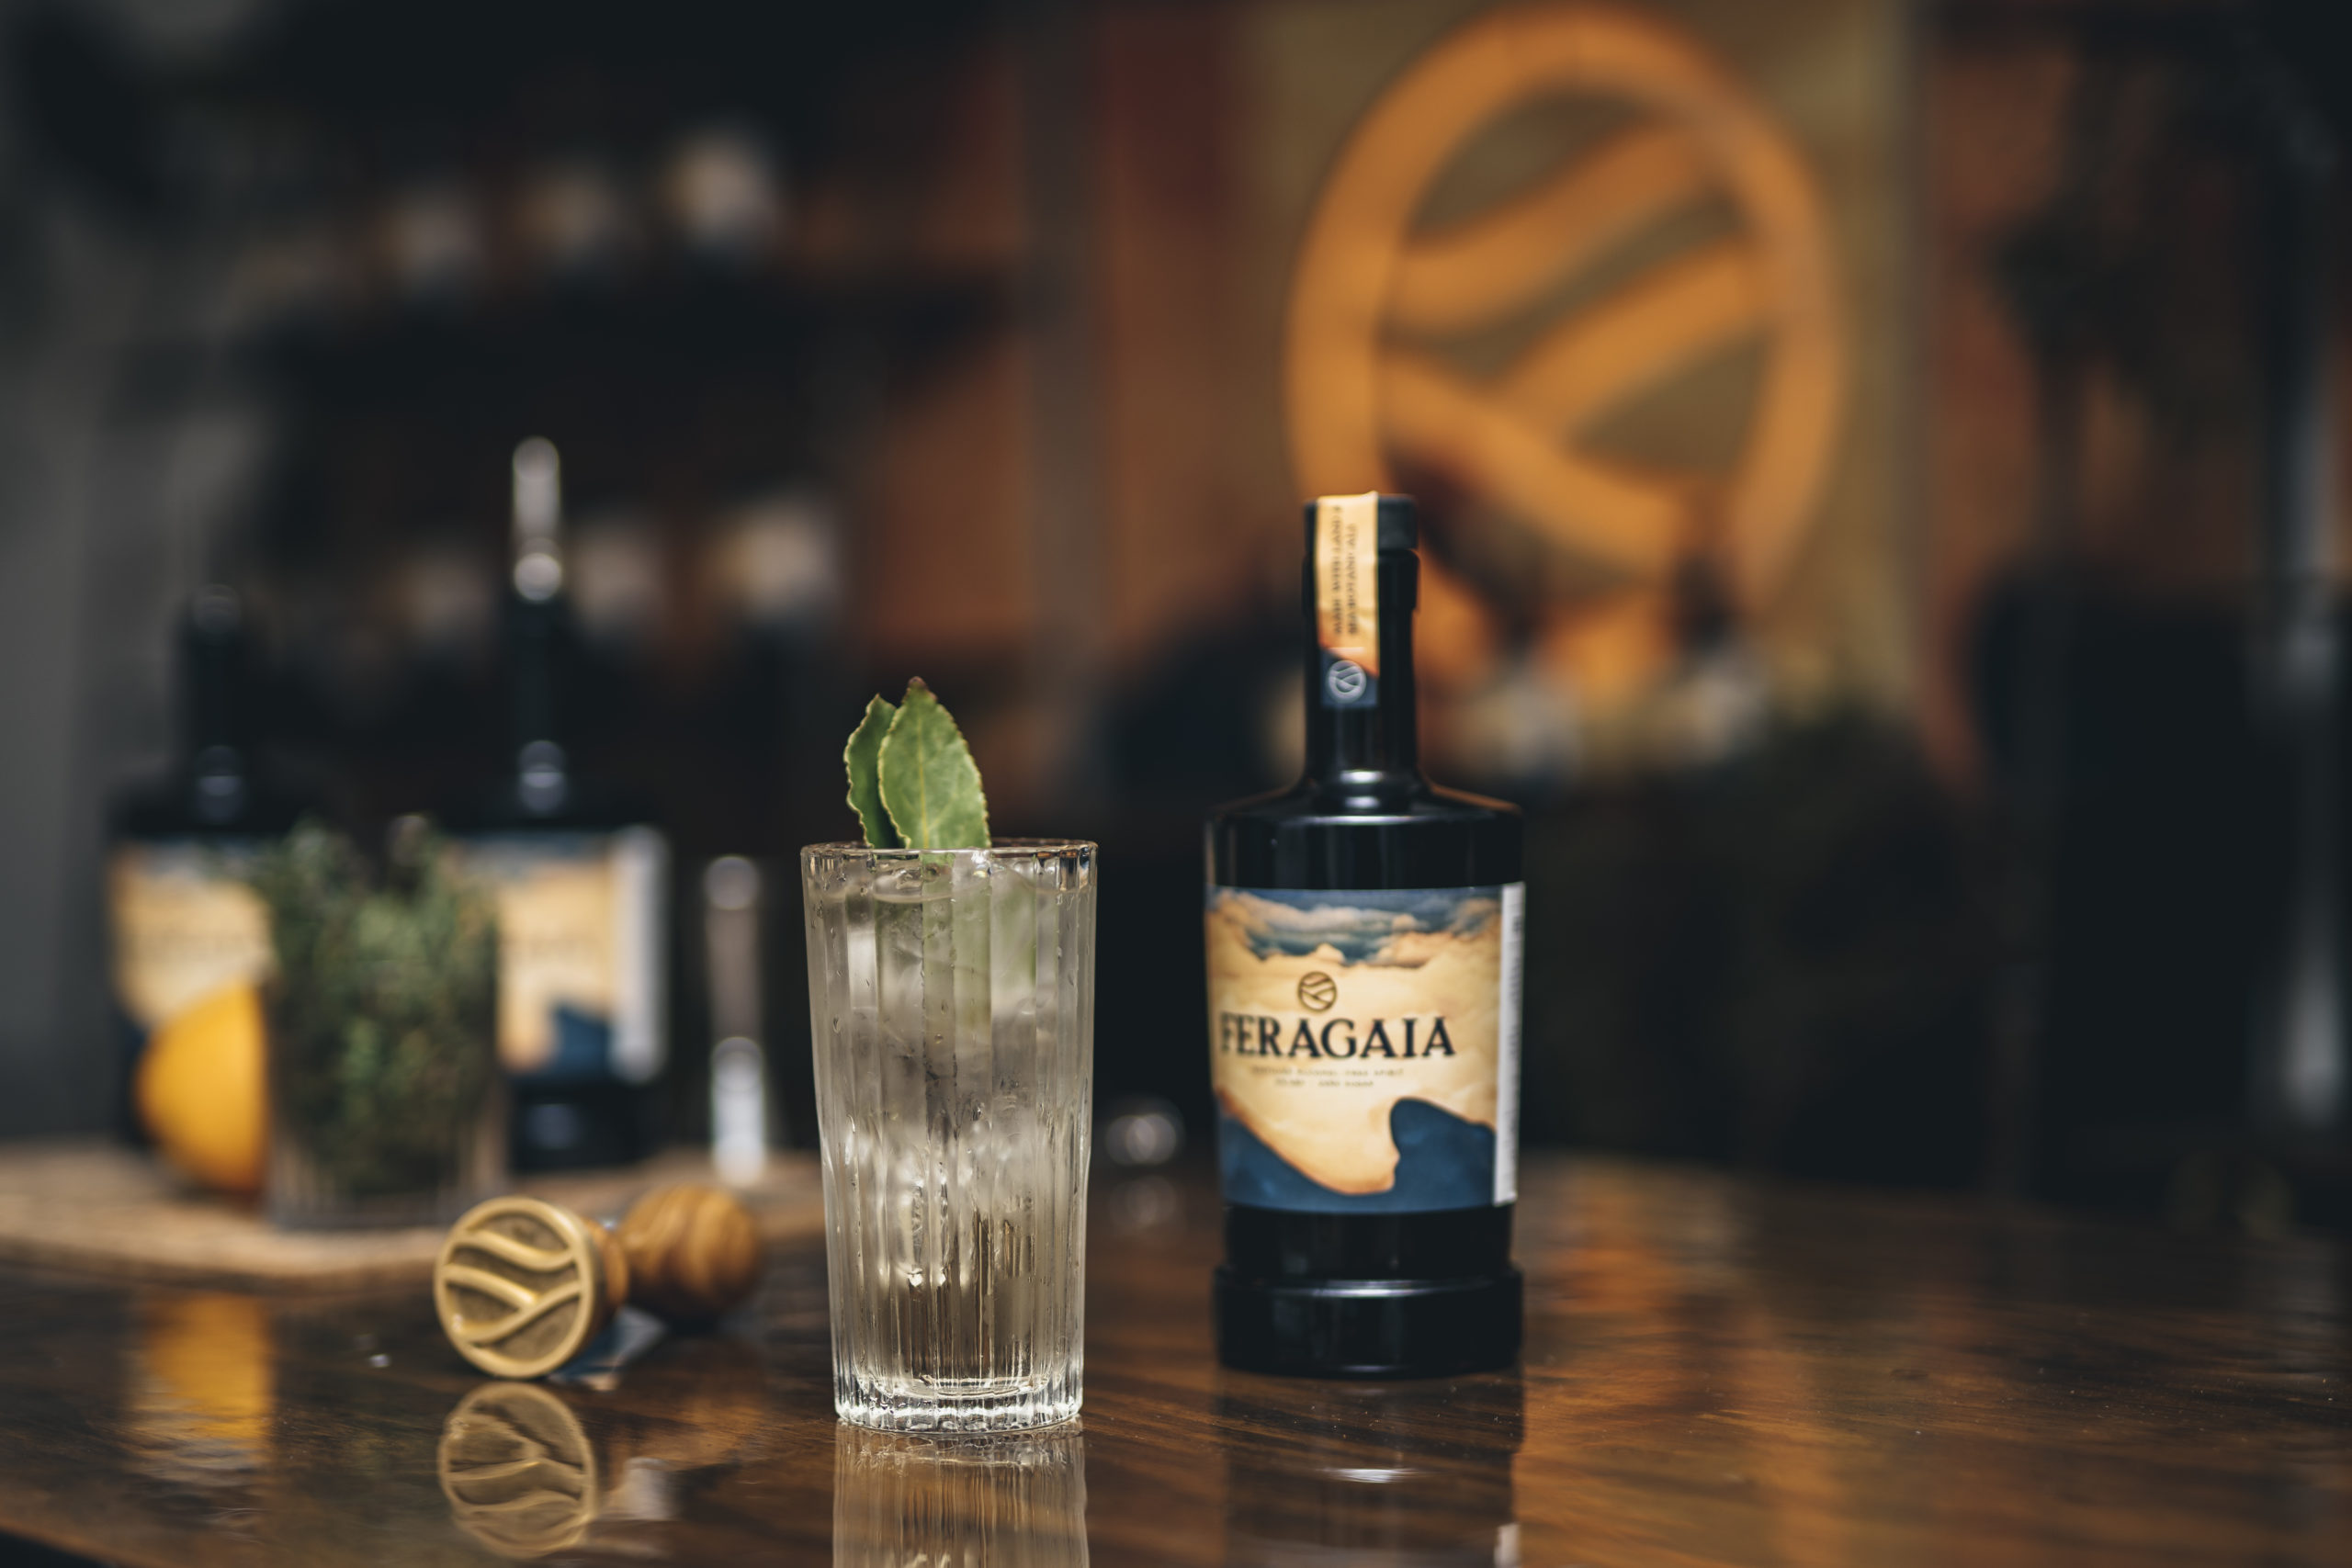 Feragaia is a new alcohol-free spirit distilled in Scotland.